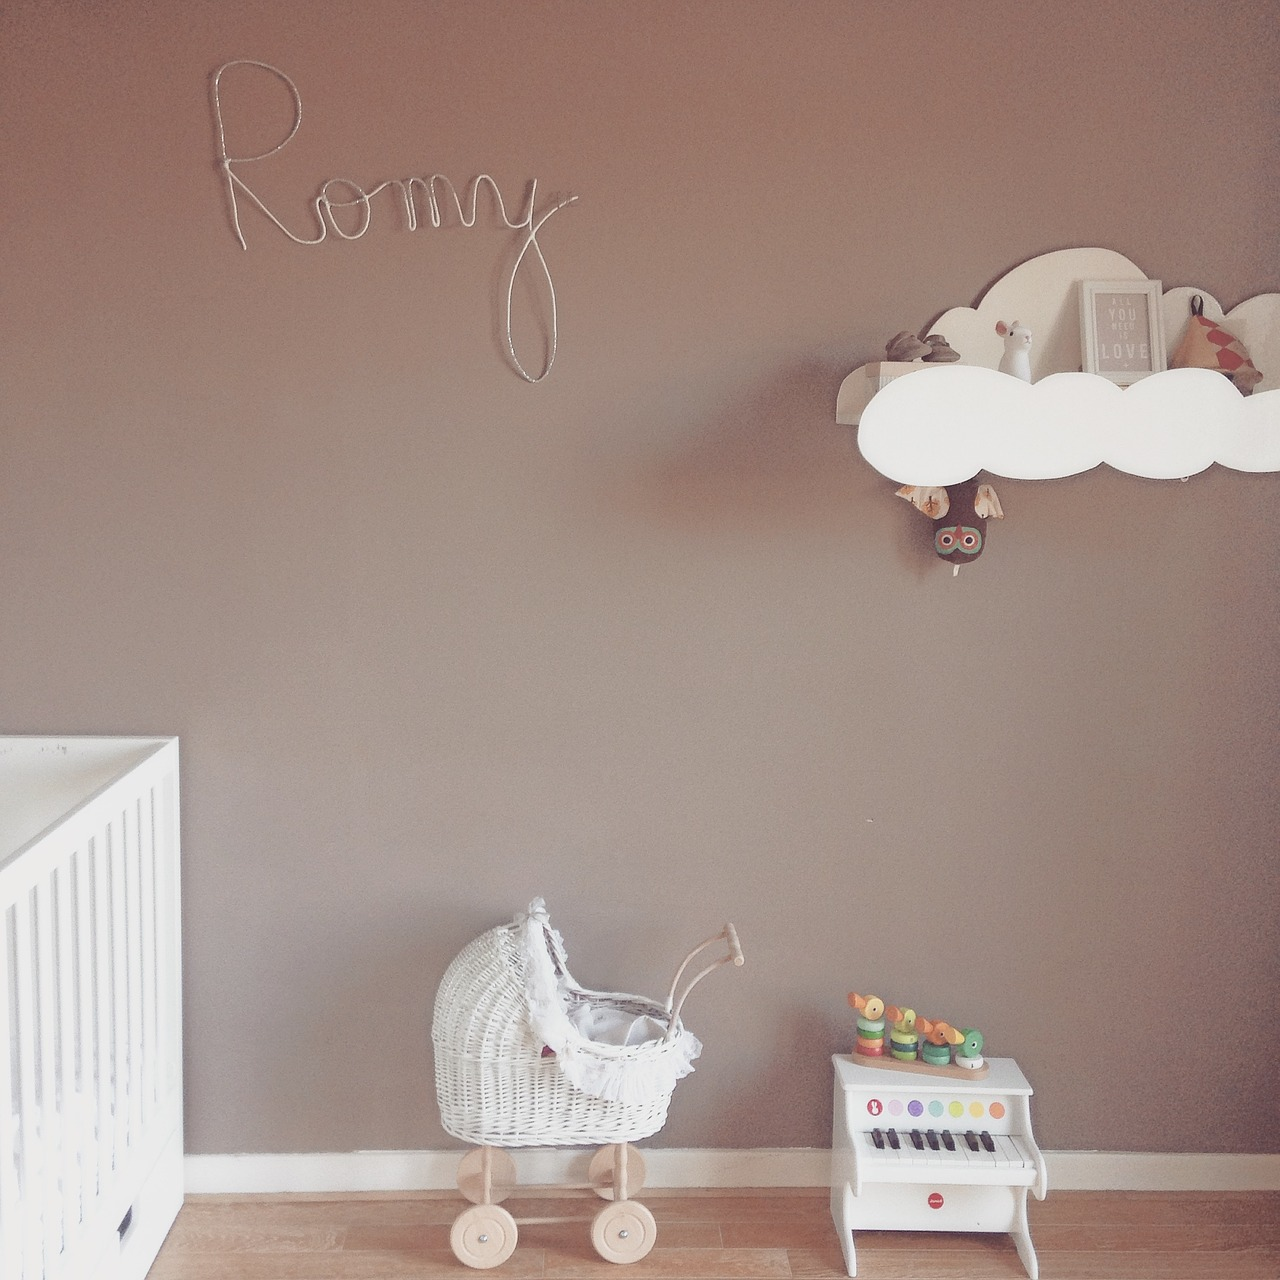 Kinderzimmer Beige zimmer-kinderzimmer-beige-baby-deko - miss made it